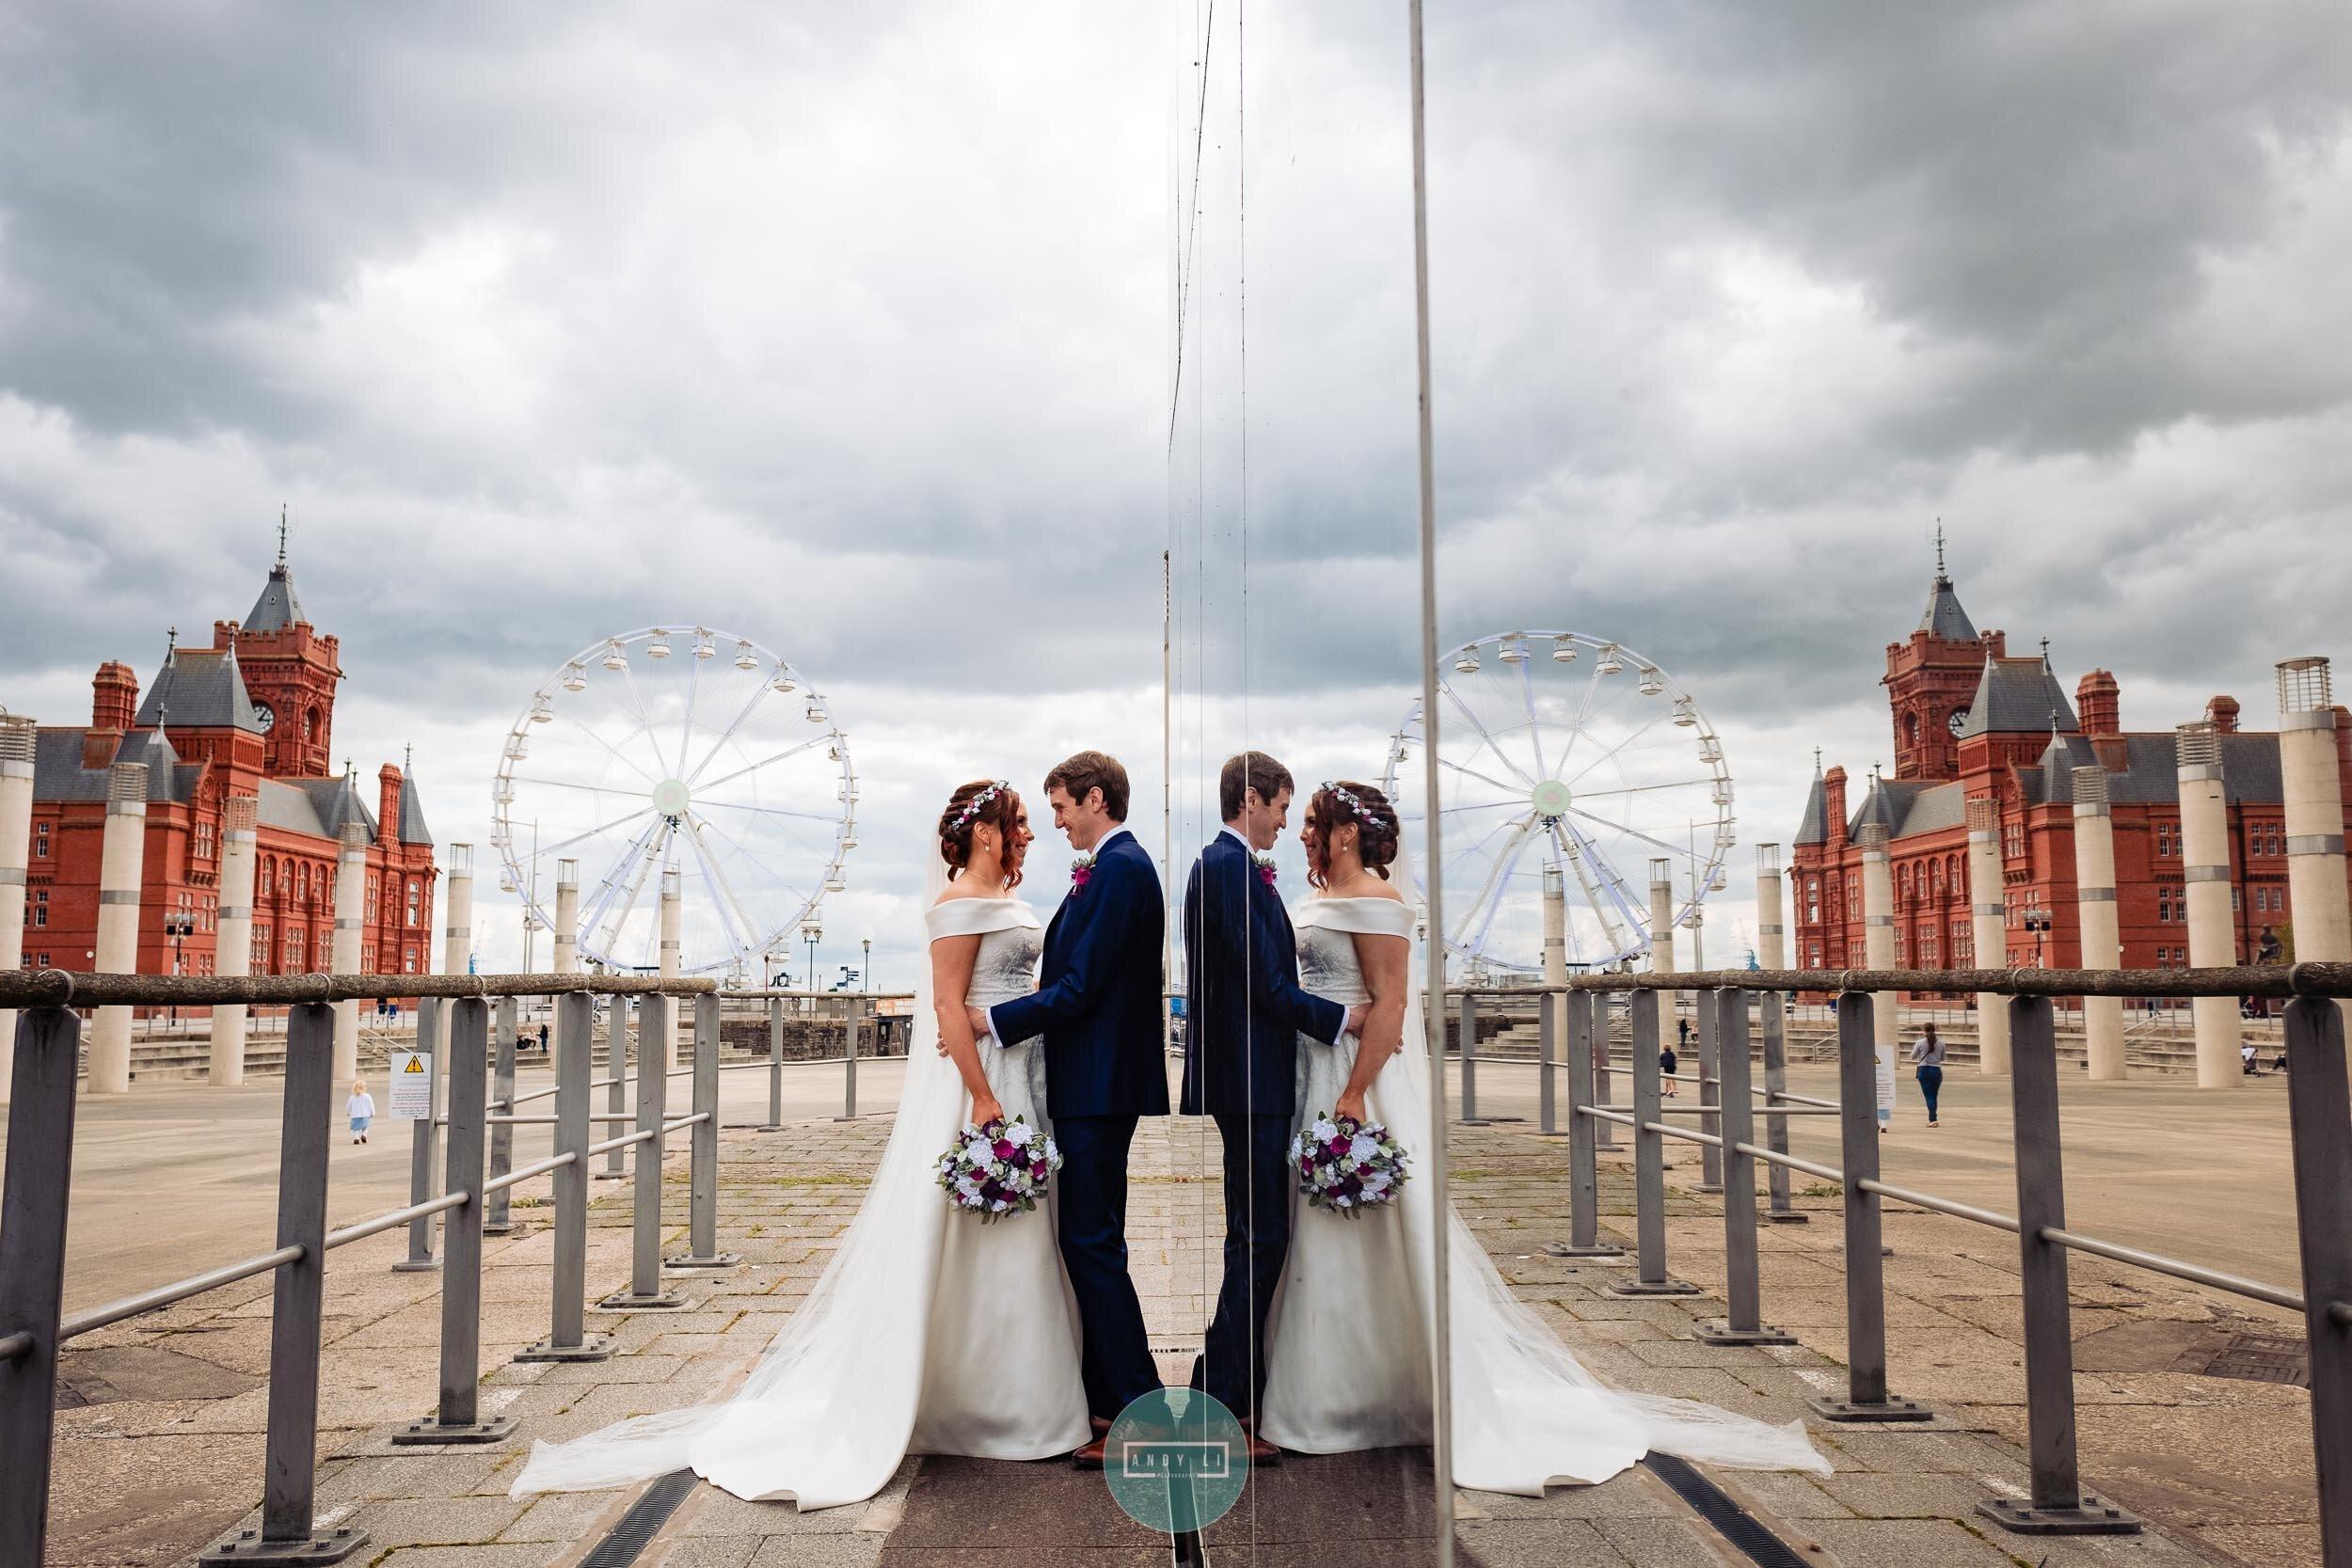 Depot Cardiff Wedding Photography-019-XPRO8945.jpg